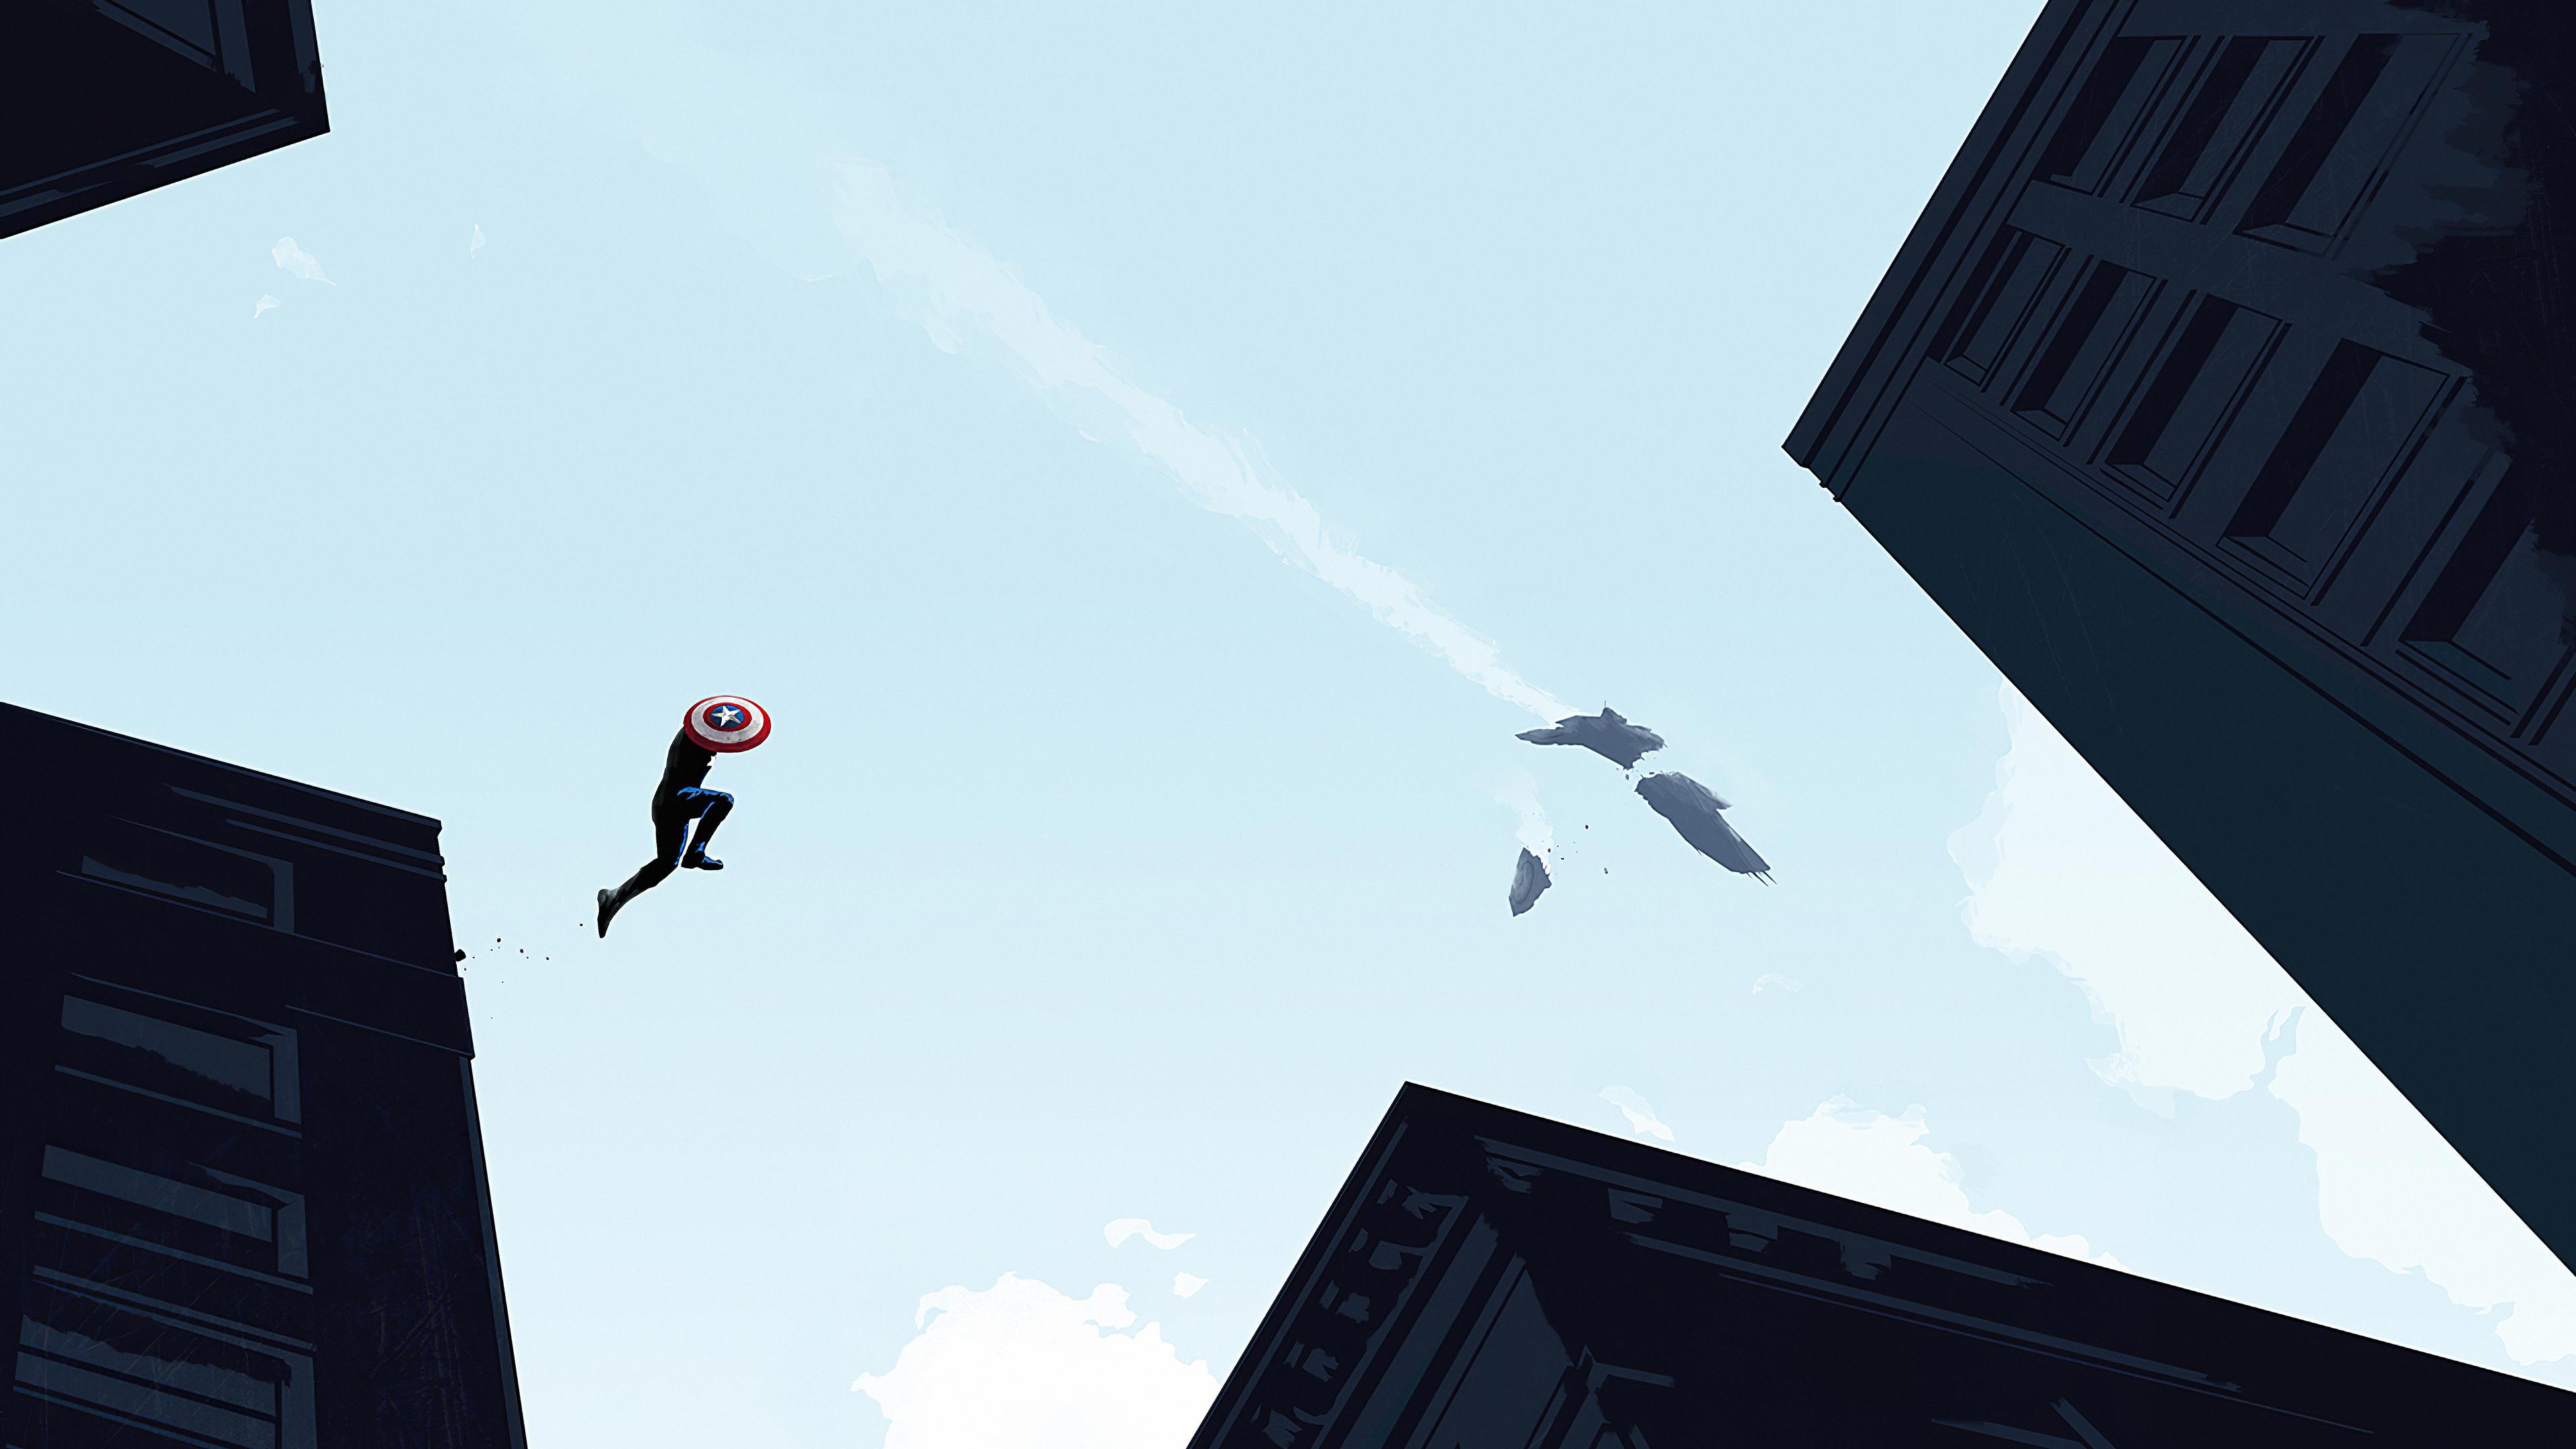 captain america jump 1572368687 - Captain America Jump - superheroes wallpapers, hd-wallpapers, captain america wallpapers, artwork wallpapers, 4k-wallpapers